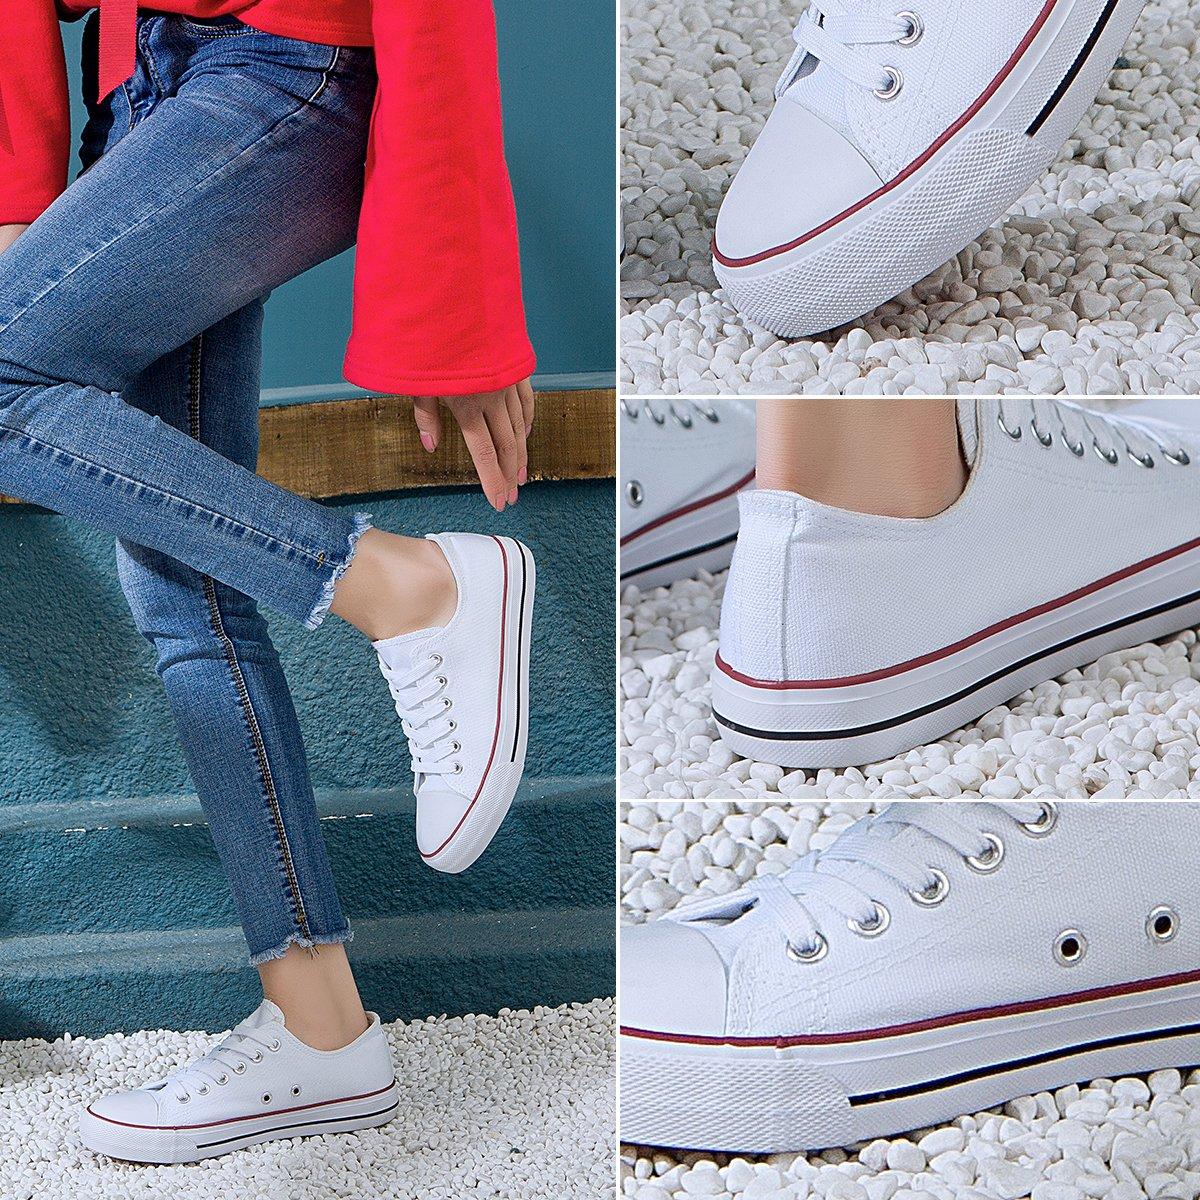 AOMAIS Womens Canvas Shoes Sneaker Low Top Lace up Fashion Walking Shoes (US7, white1) … by AOMAIS (Image #4)